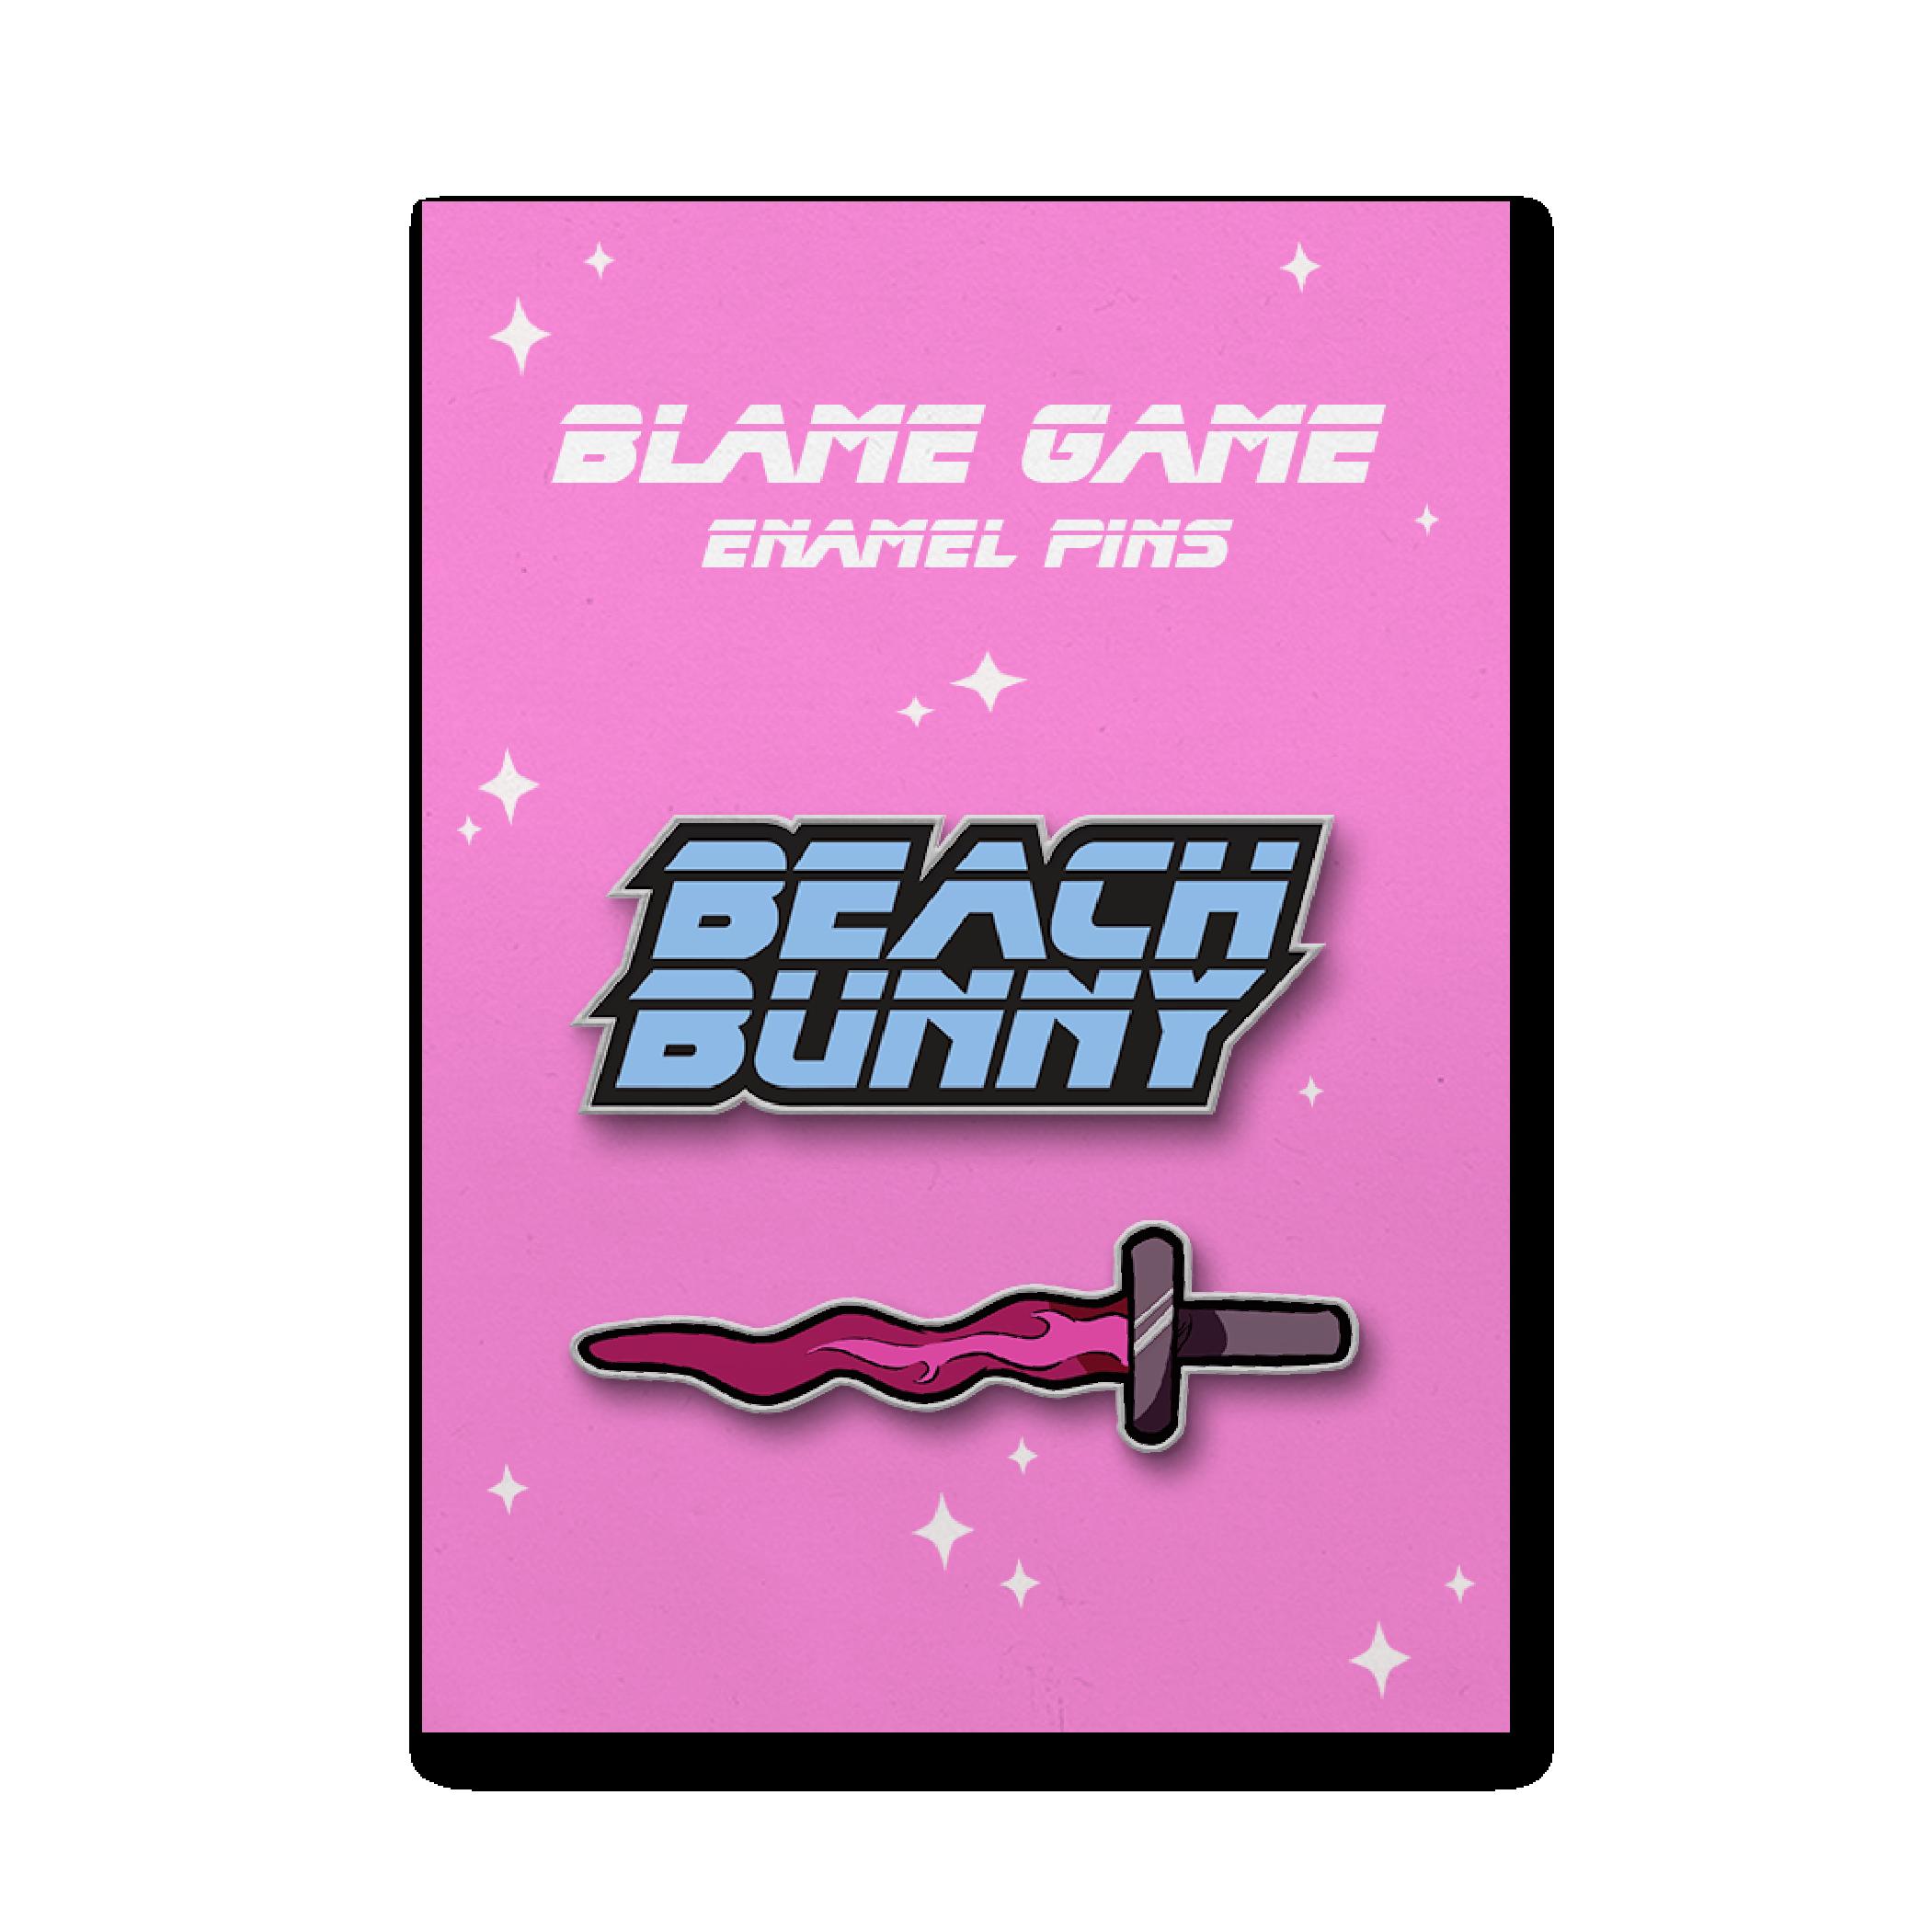 Blame Game Enamel Pins